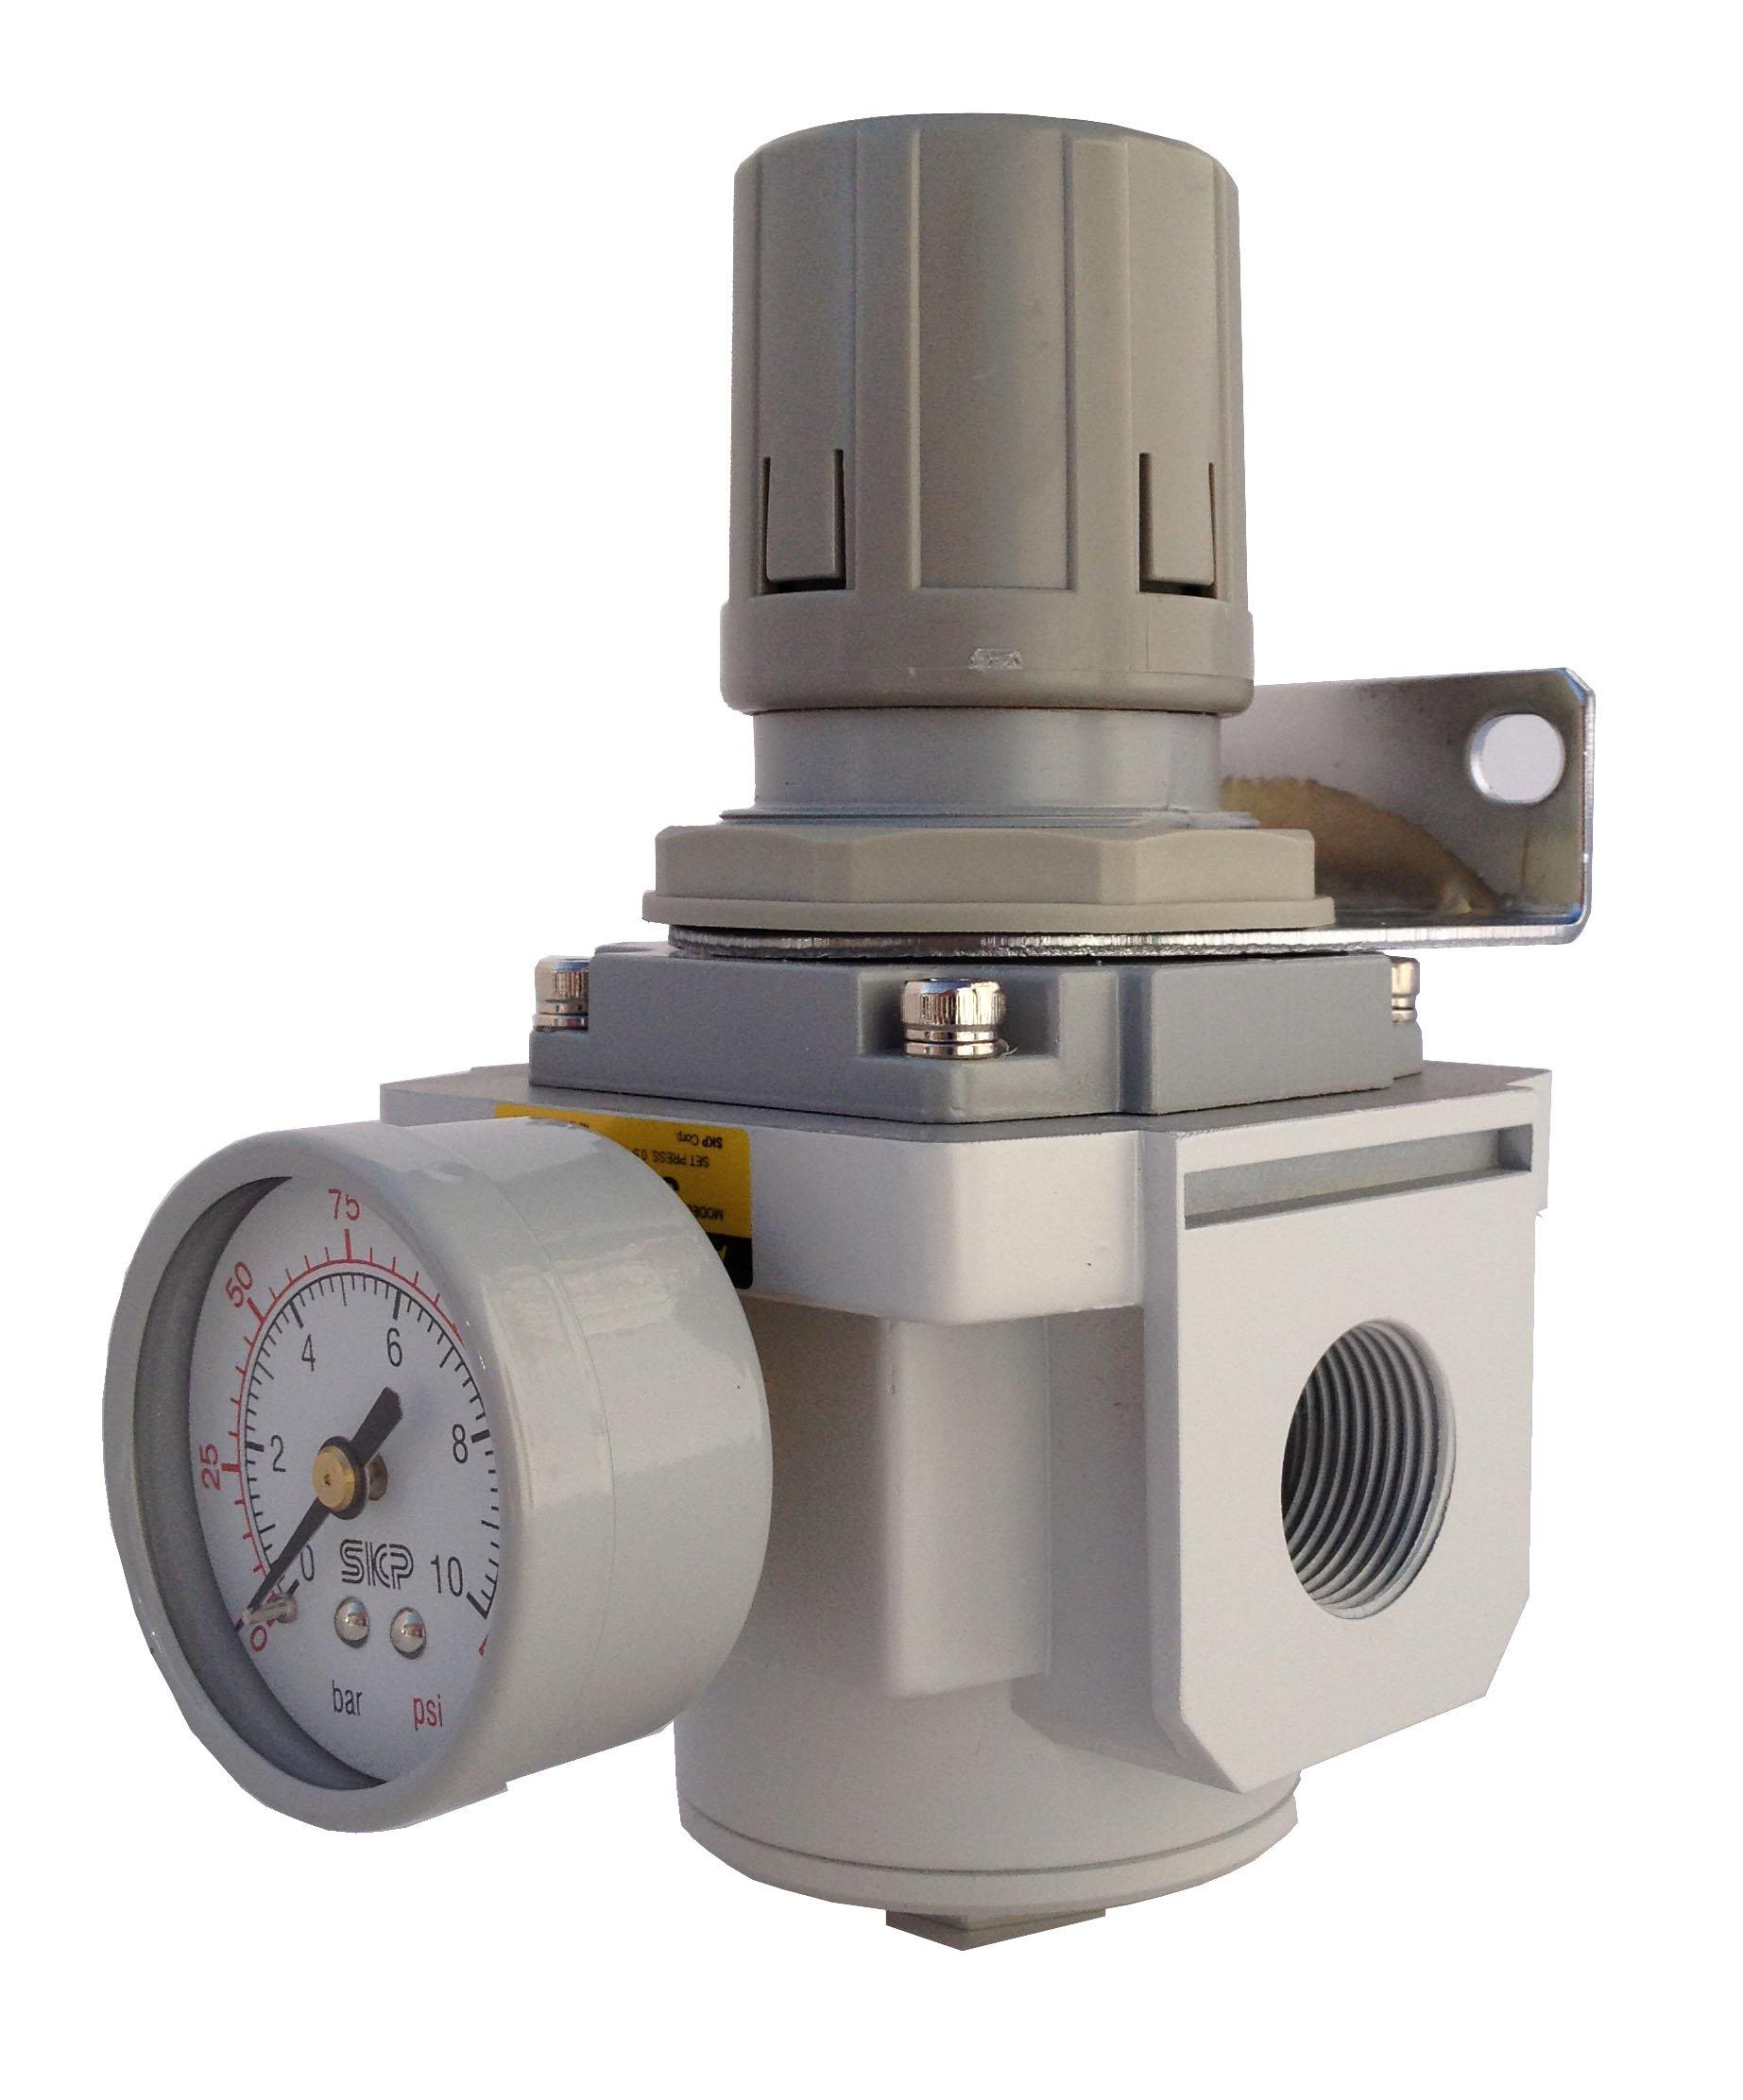 PneumaticPlus SAR3000M-N03BG Air Pressure Regulator, 3/8'' Pipe Size, NPT with Gauge and Bracket by PneumaticPlus